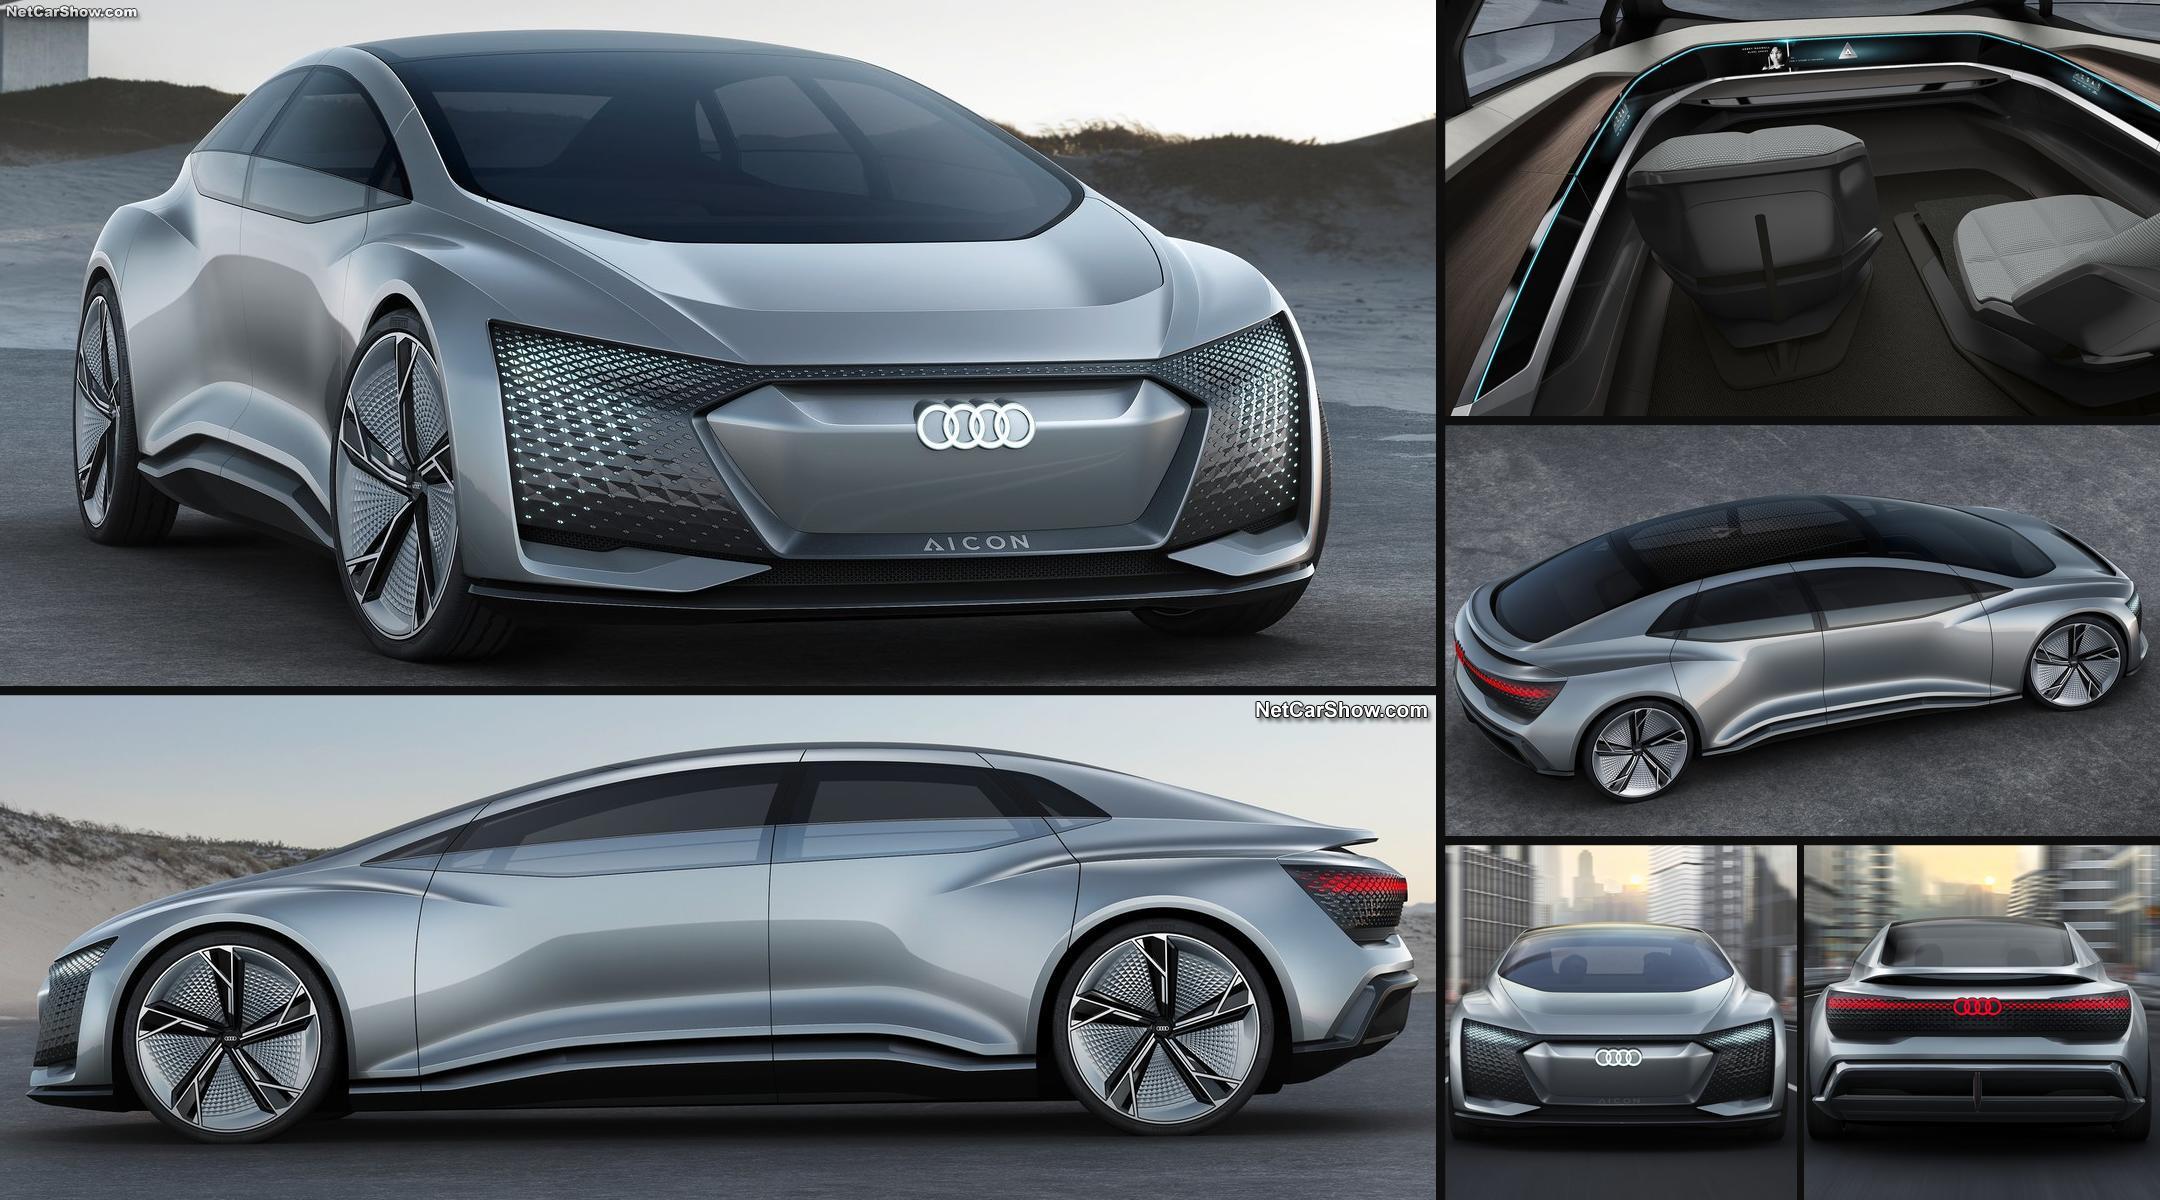 Kelebihan Audi Aicon Harga